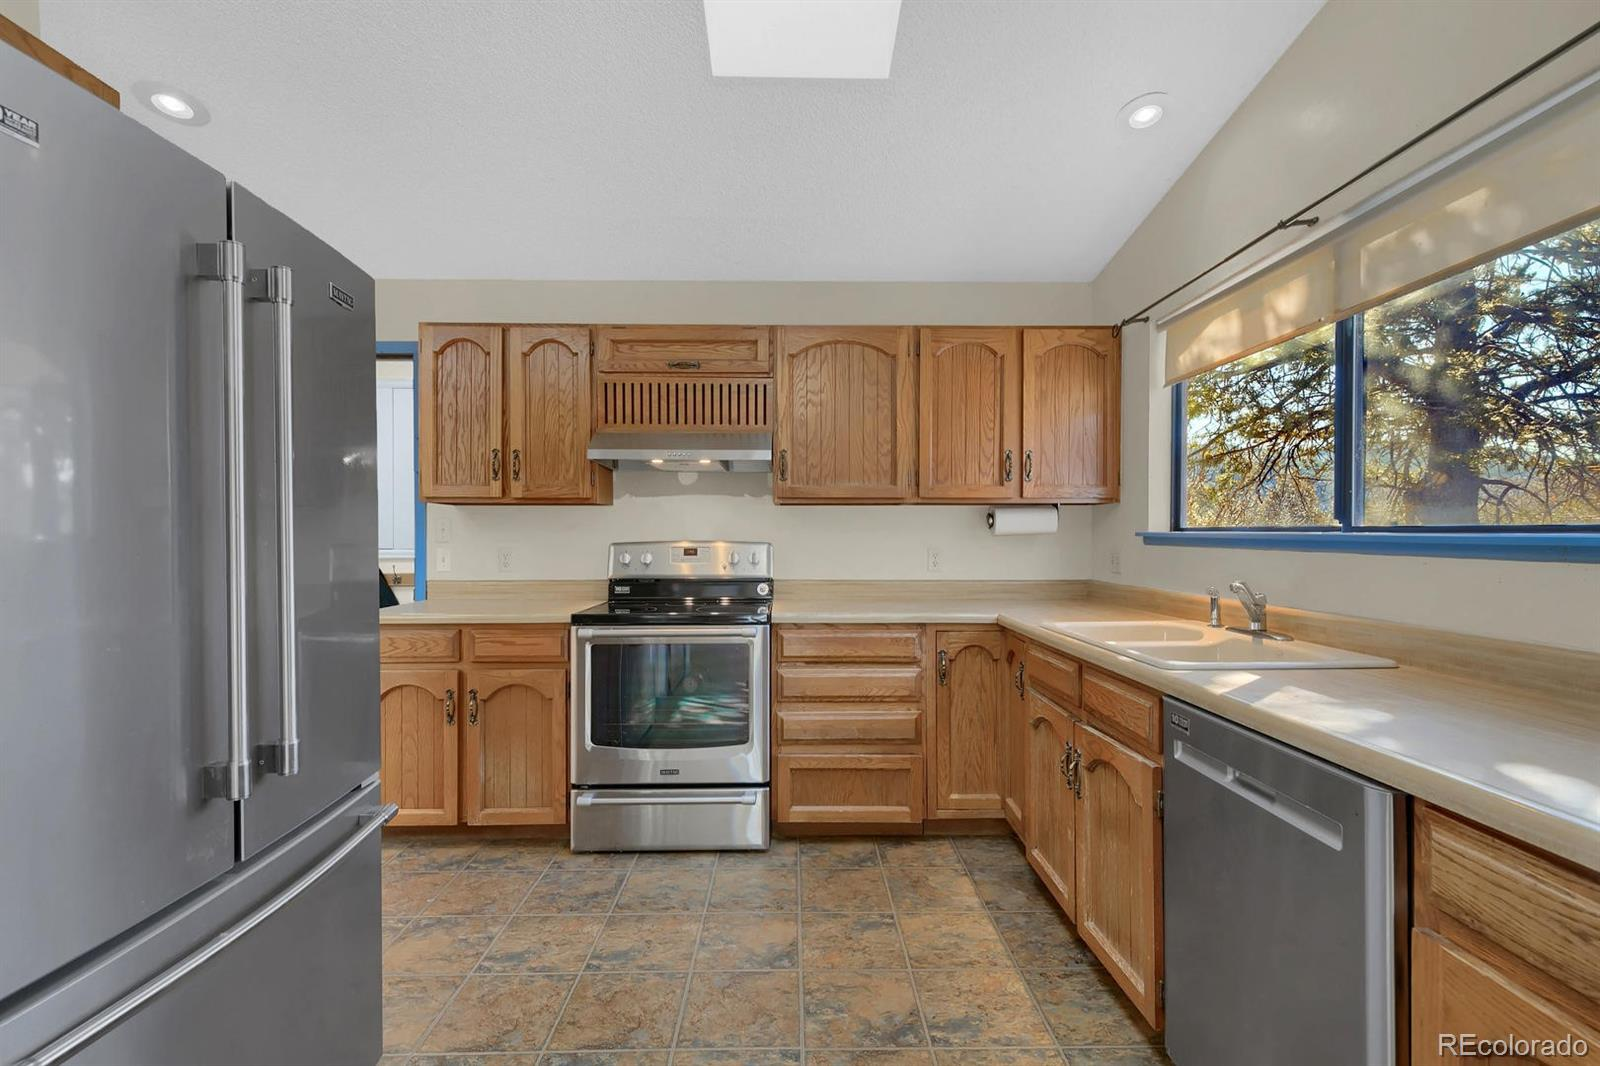 MLS# 2704020 - 8 - 11440 Valle Verde Drive, Colorado Springs, CO 80926